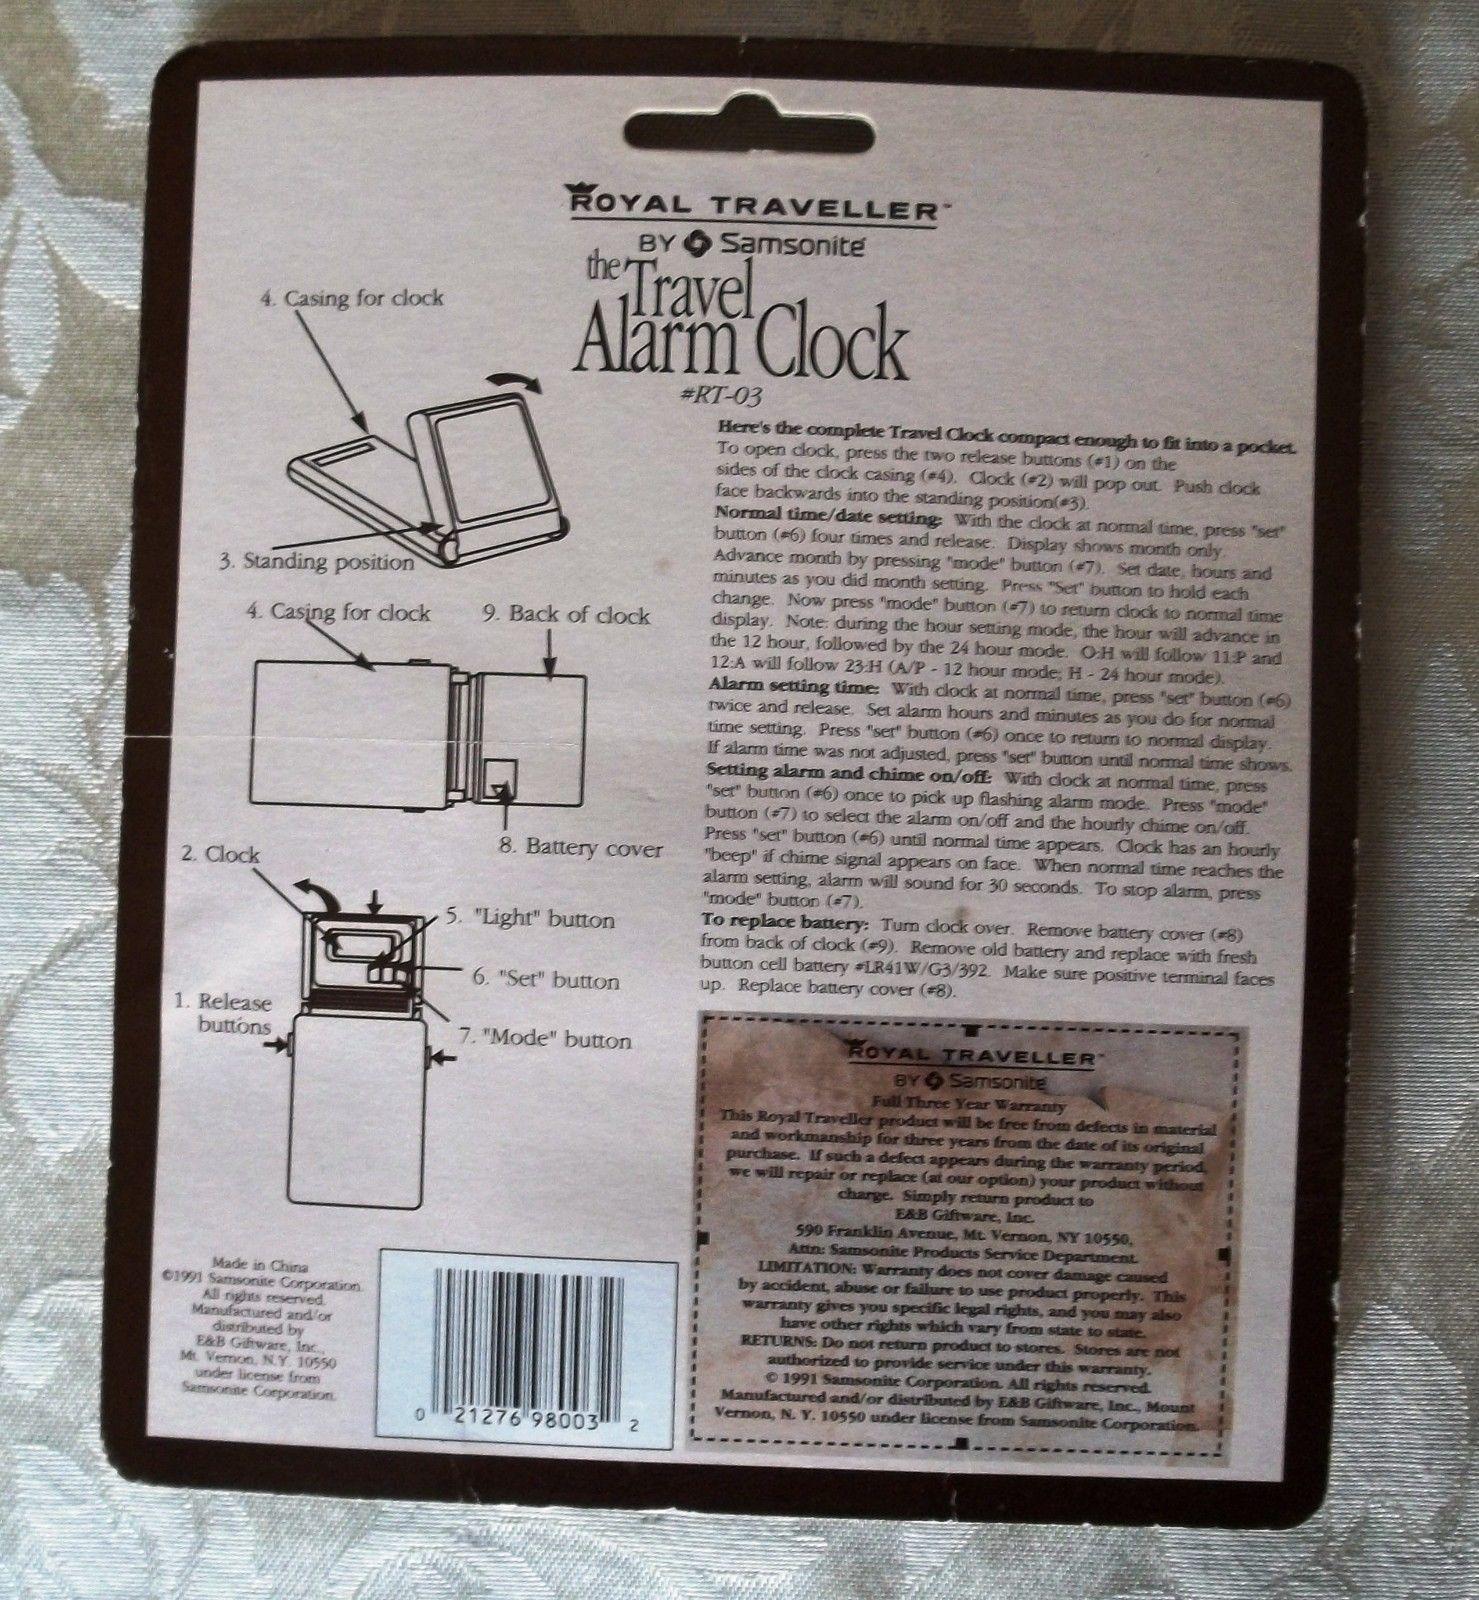 Travel Alarm Clock, Royal Traveler by Samsonite